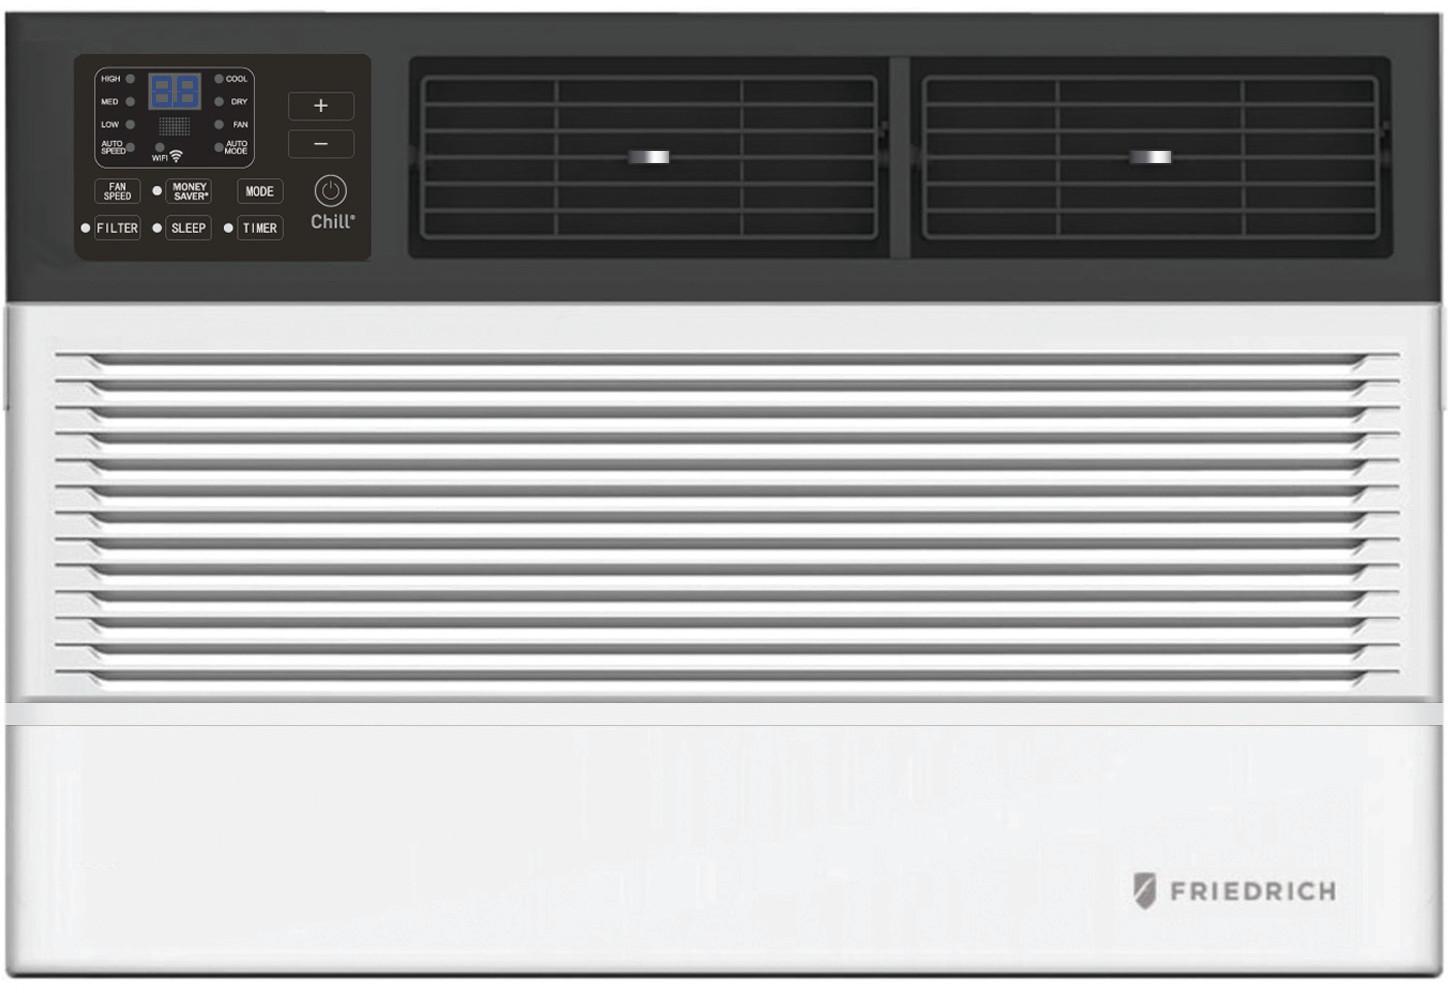 garrison 10000 btu window air conditioner manual